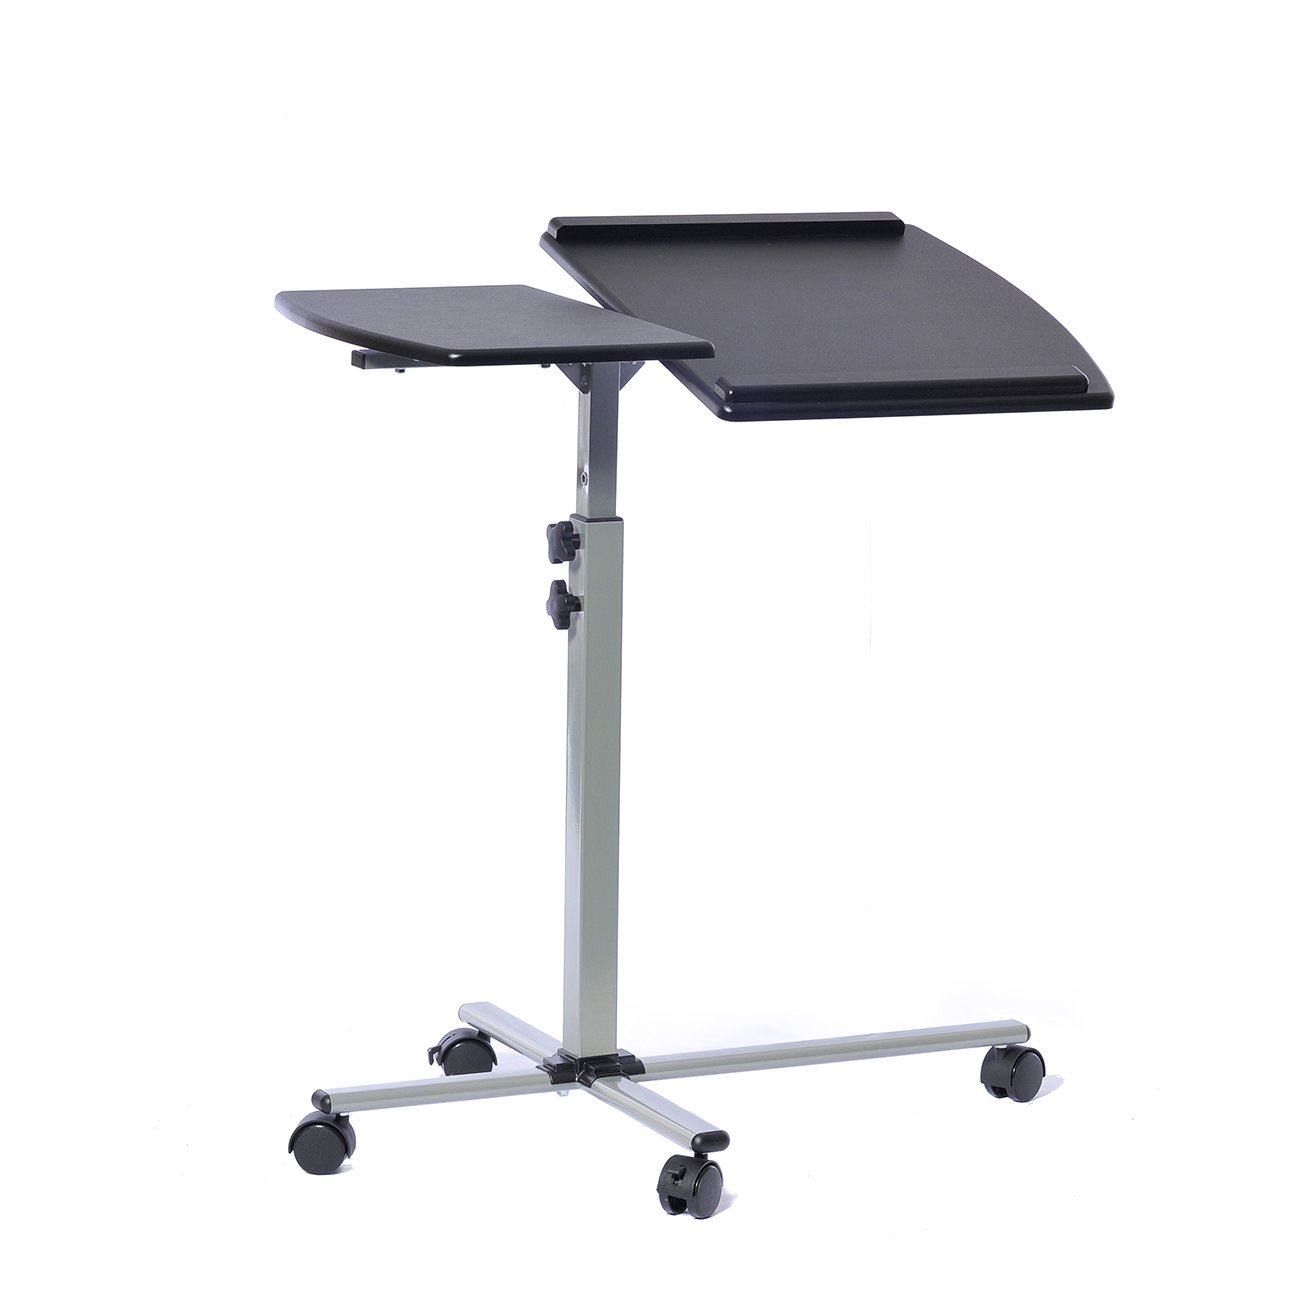 Techni Mobili RTA-B003-GPH06 Rolling Adjustable Laptop Cart, Graphite by Techni Mobili